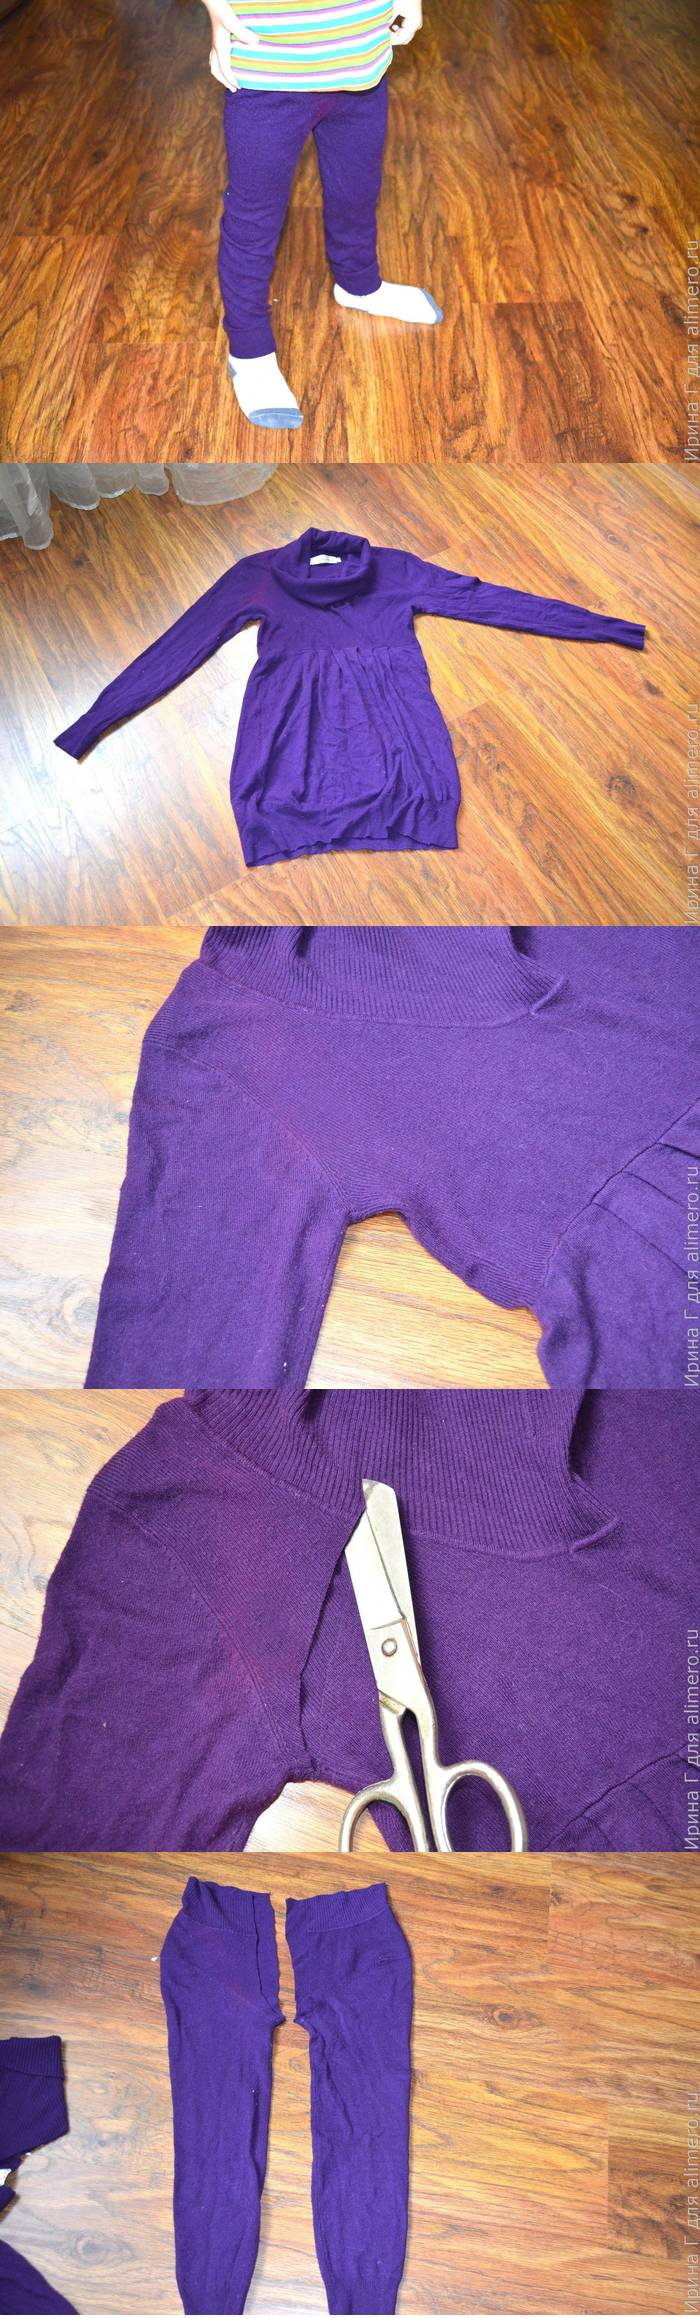 Штанишки ребенку  из старого свитера за 30 минут